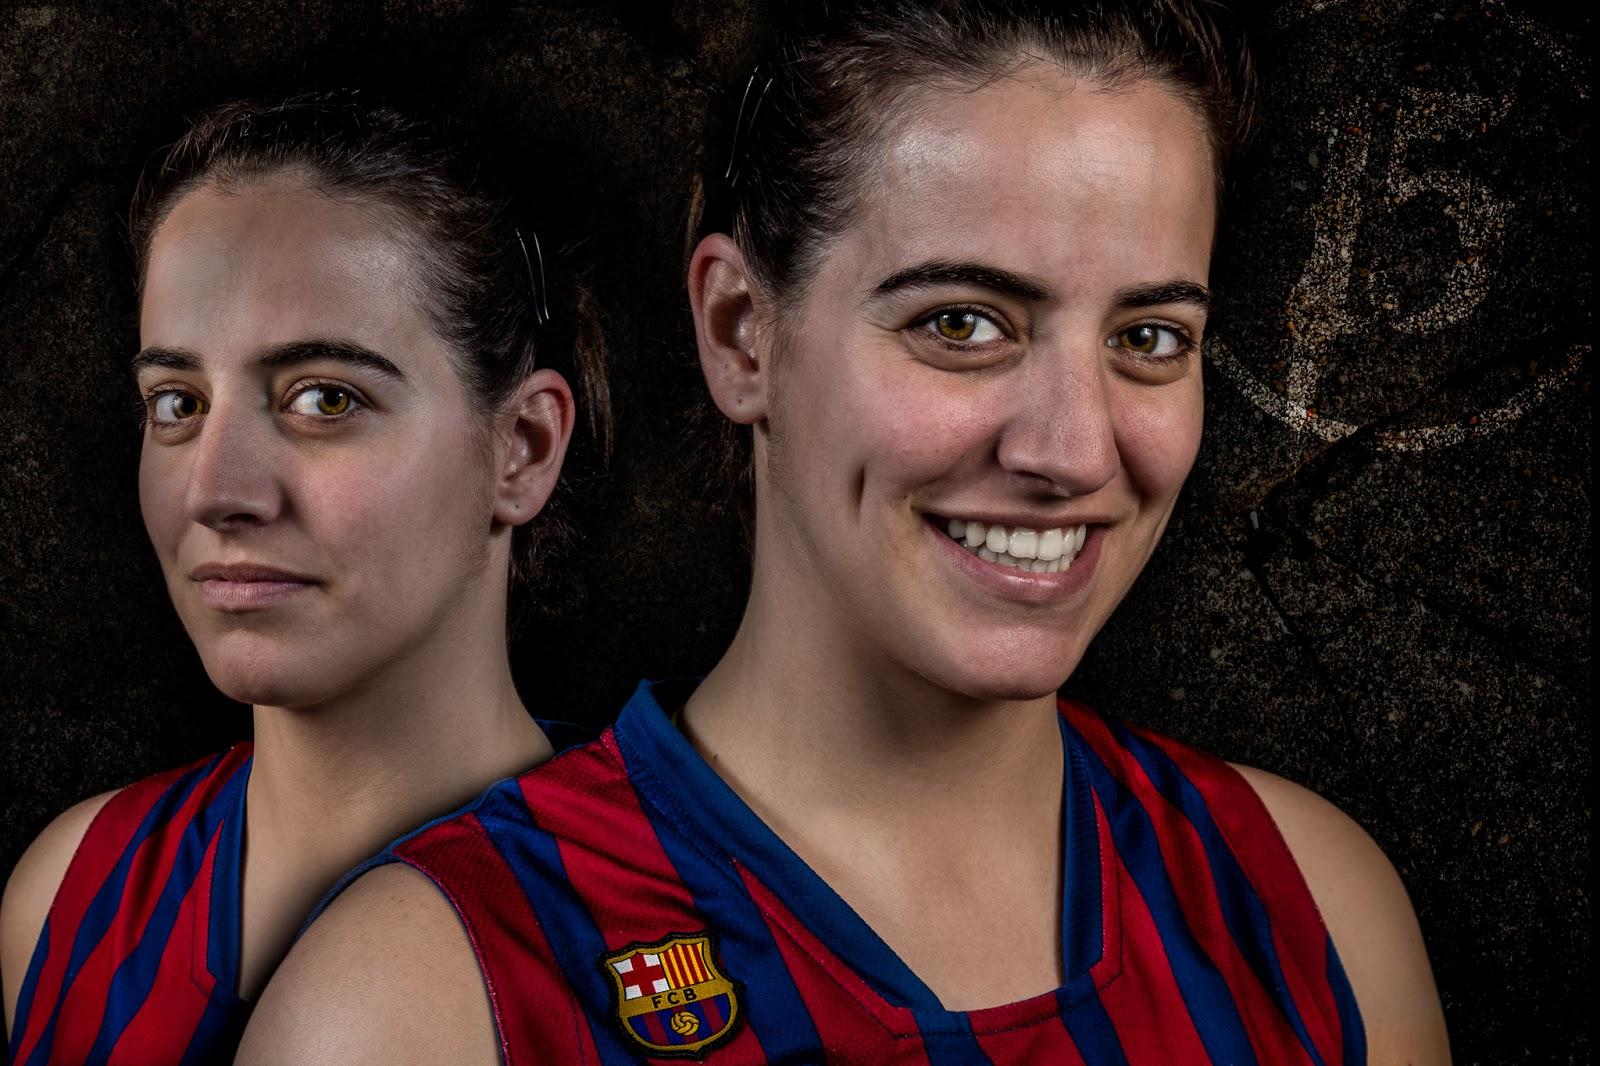 Aida 15 - CBS Barça Senior Femenino A - 2013 :: 2 x Canon EOS 5D MkIII | ISO100 | Canon 24-105 @50&60mm | f/11 | 1/60s